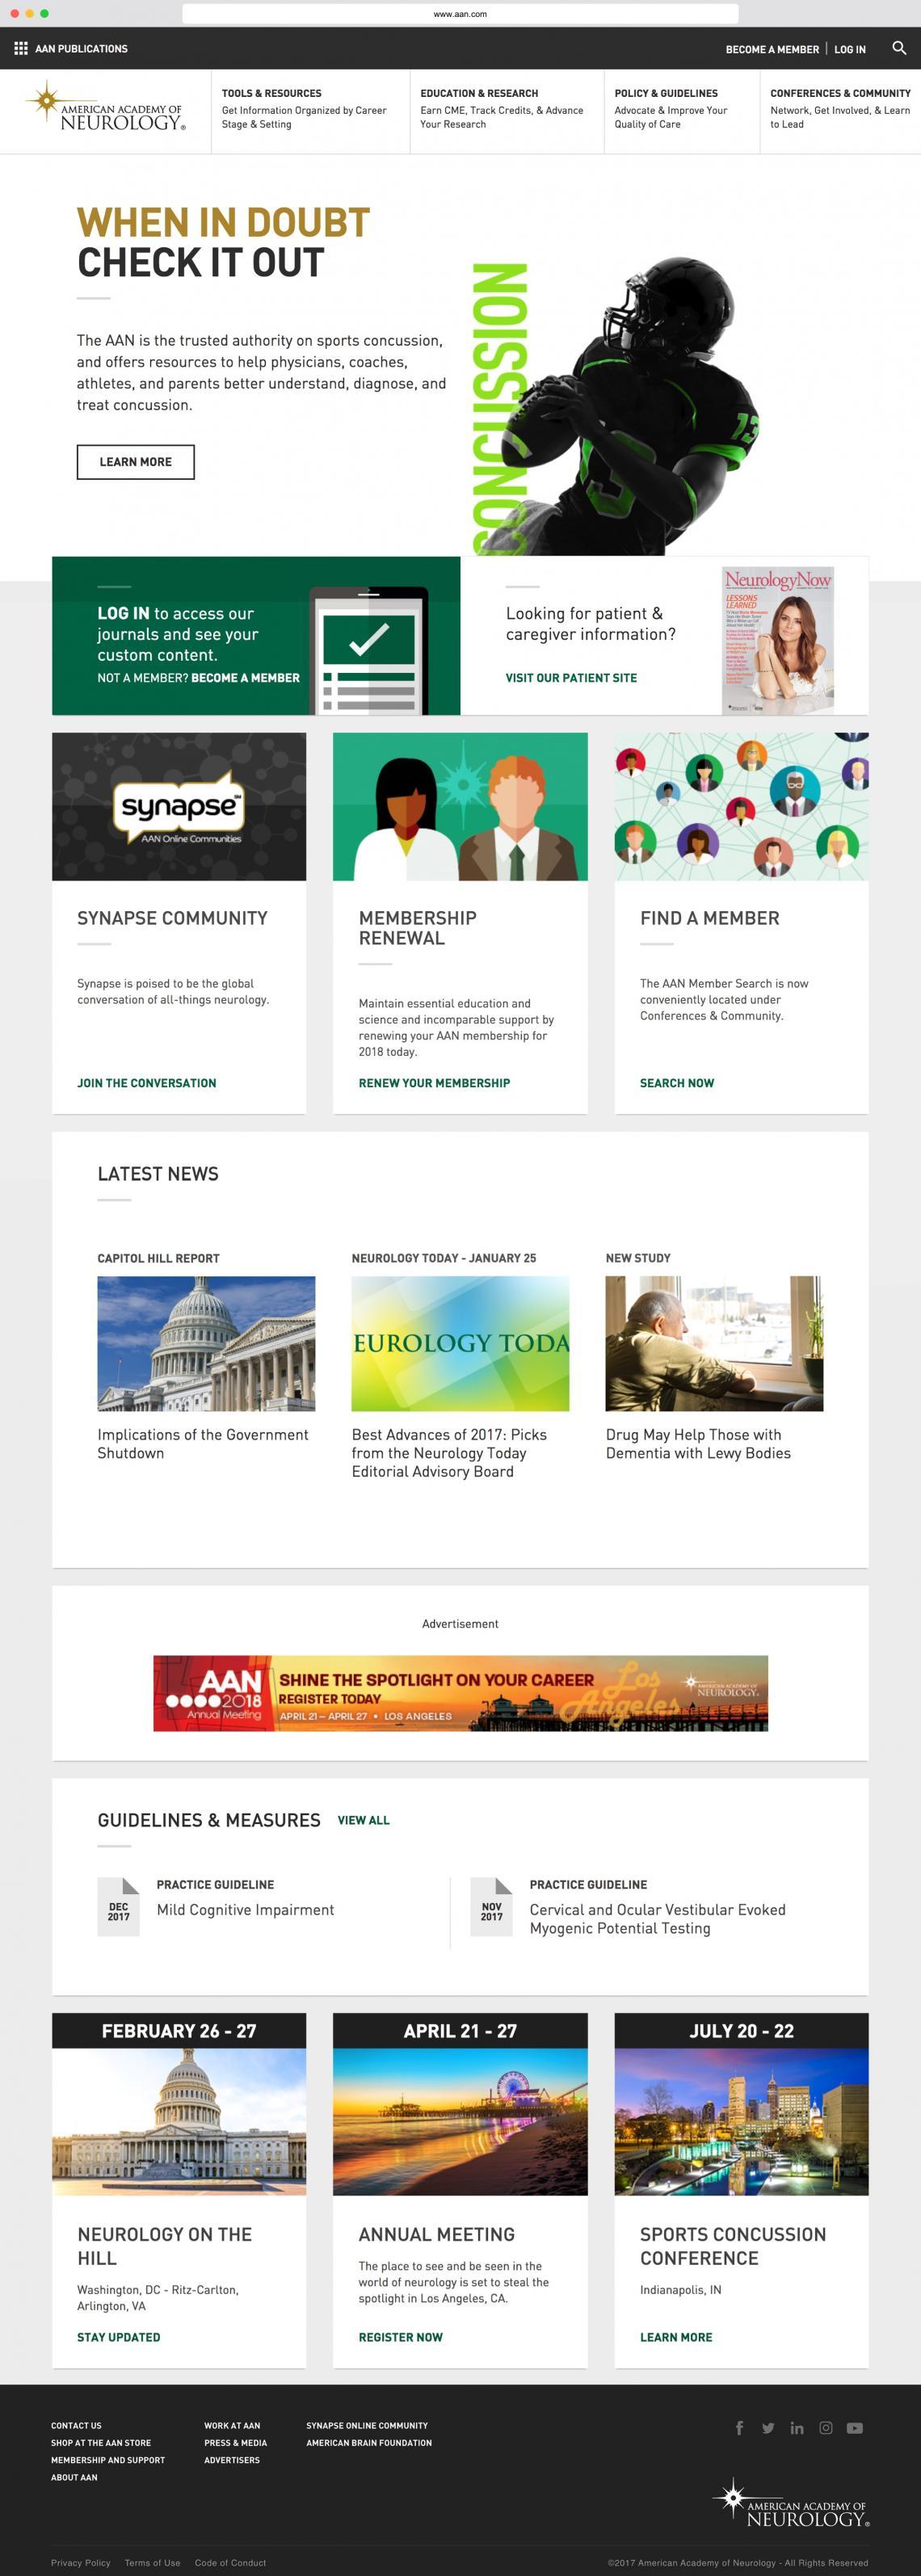 American Academy of Neurology | Digital Pulp